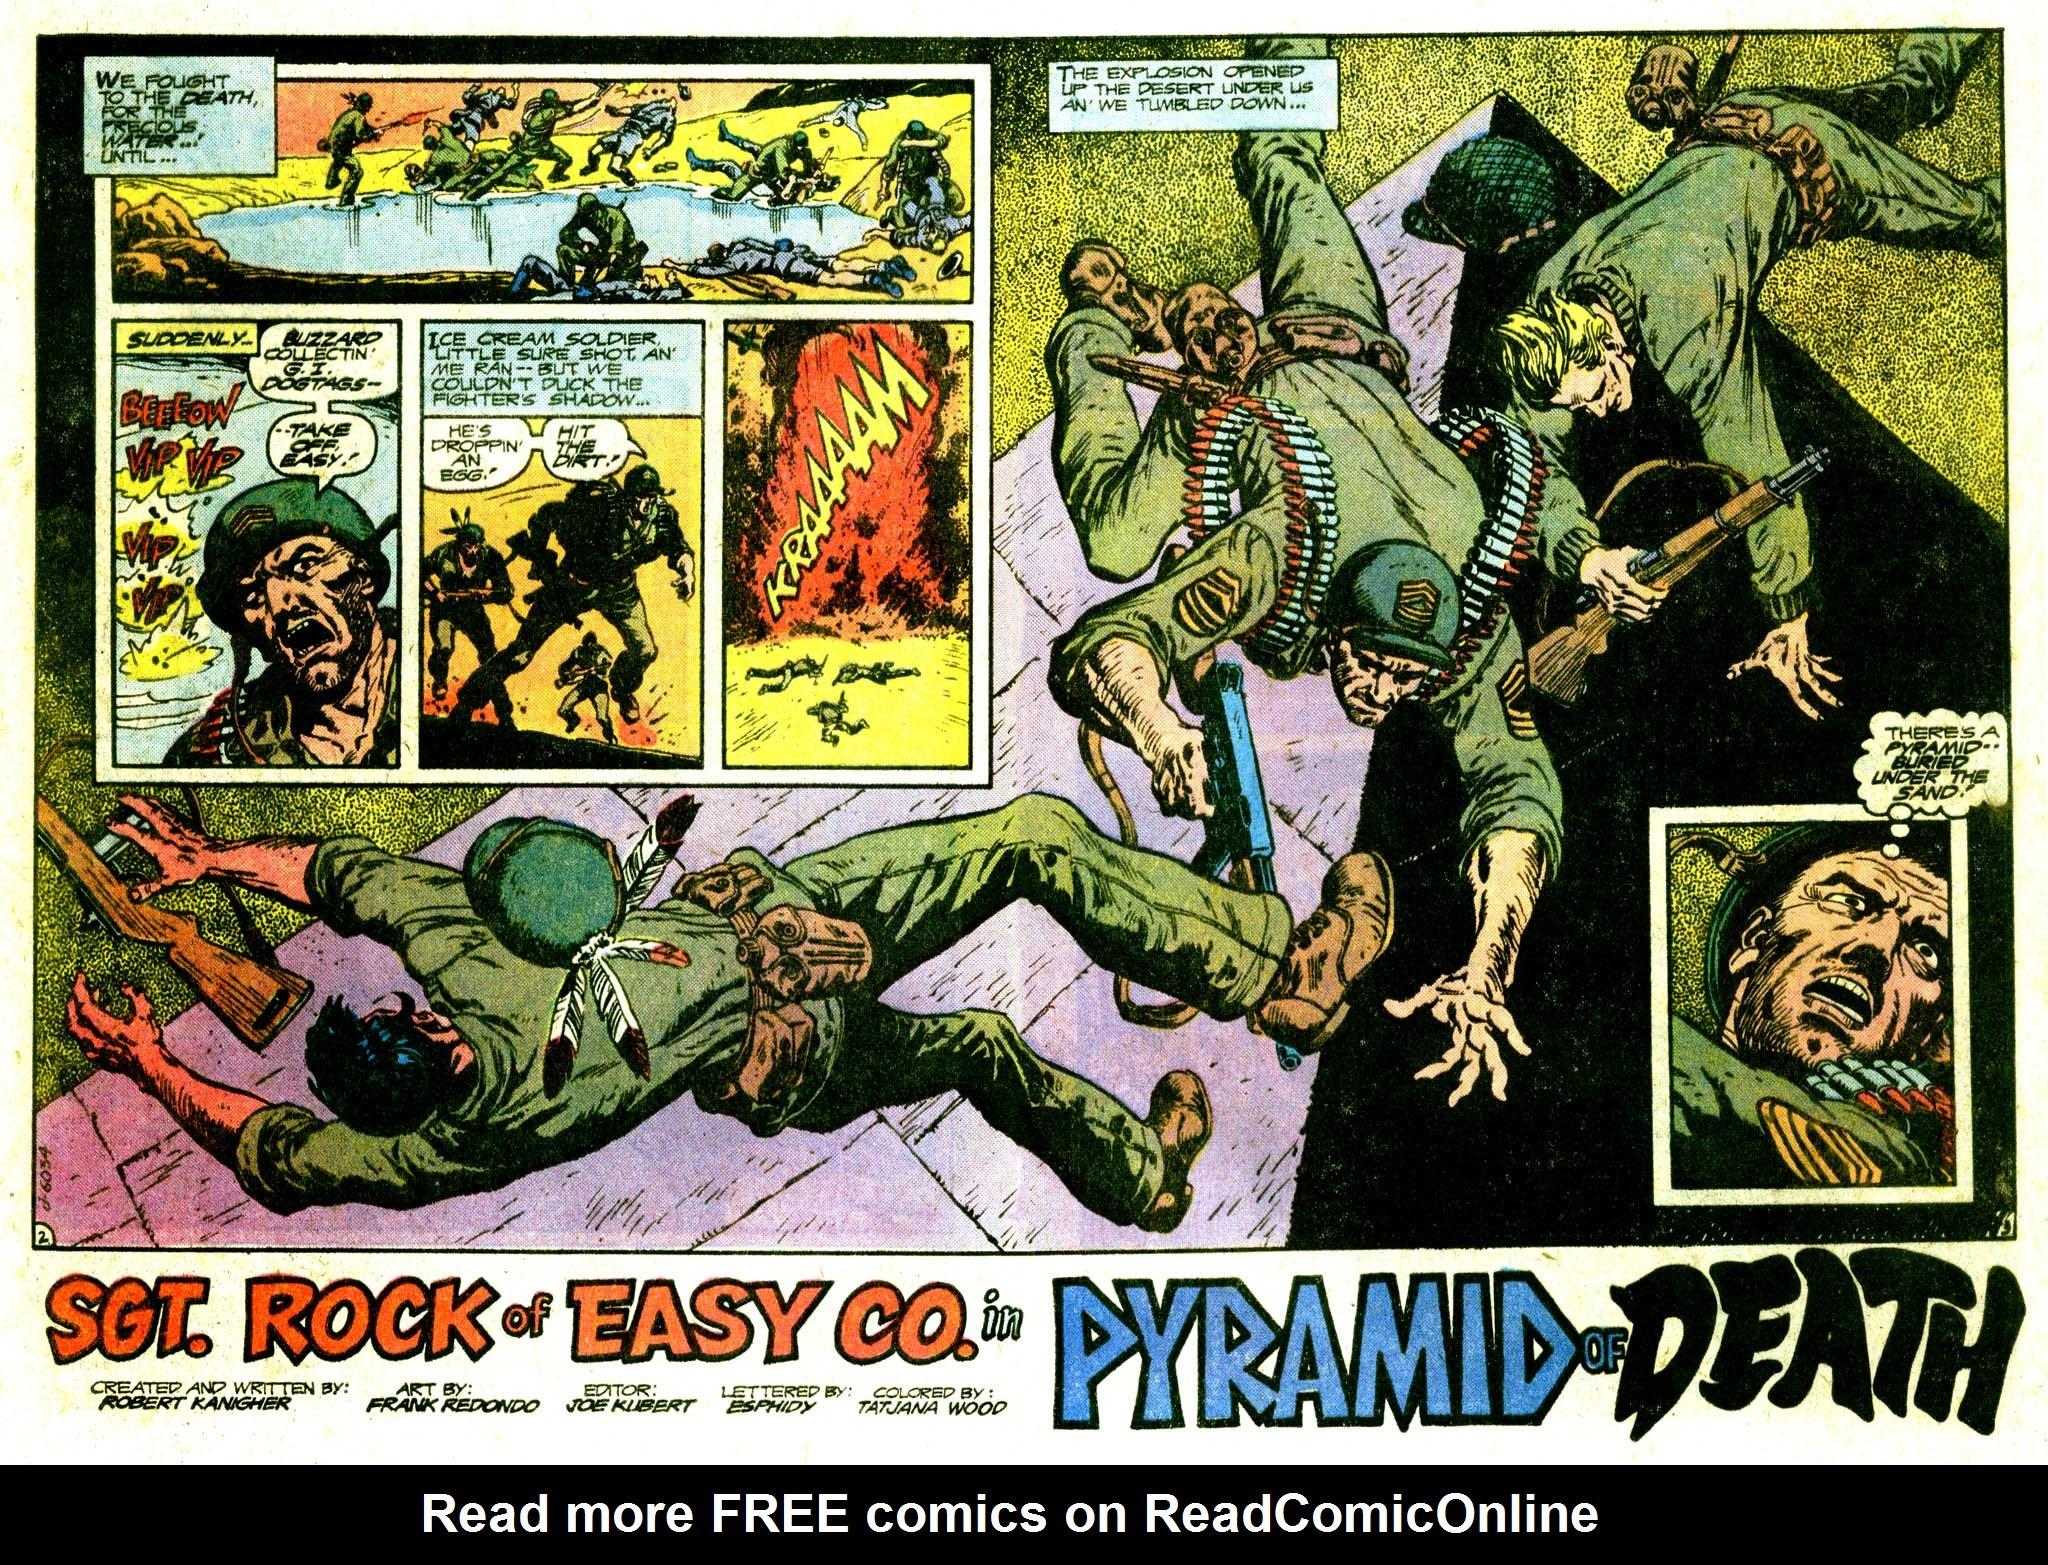 Read online Sgt. Rock comic -  Issue #332 - 4